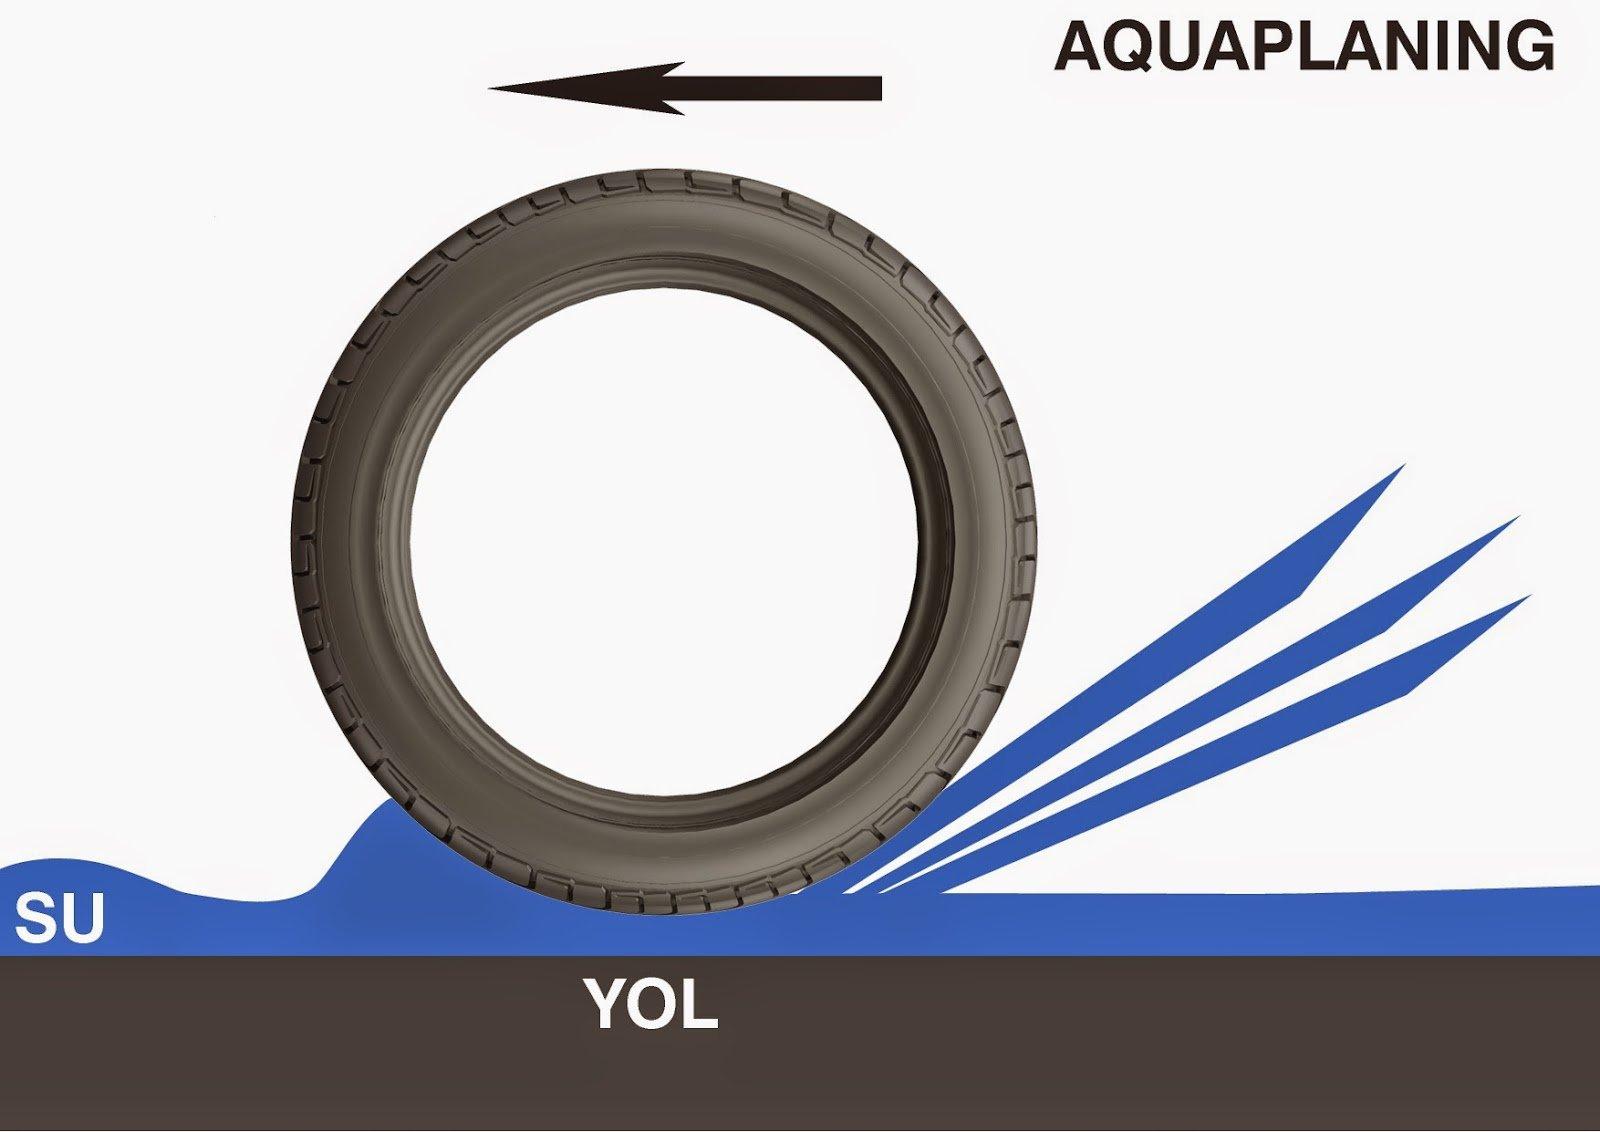 Aquaplaning illusztrácio